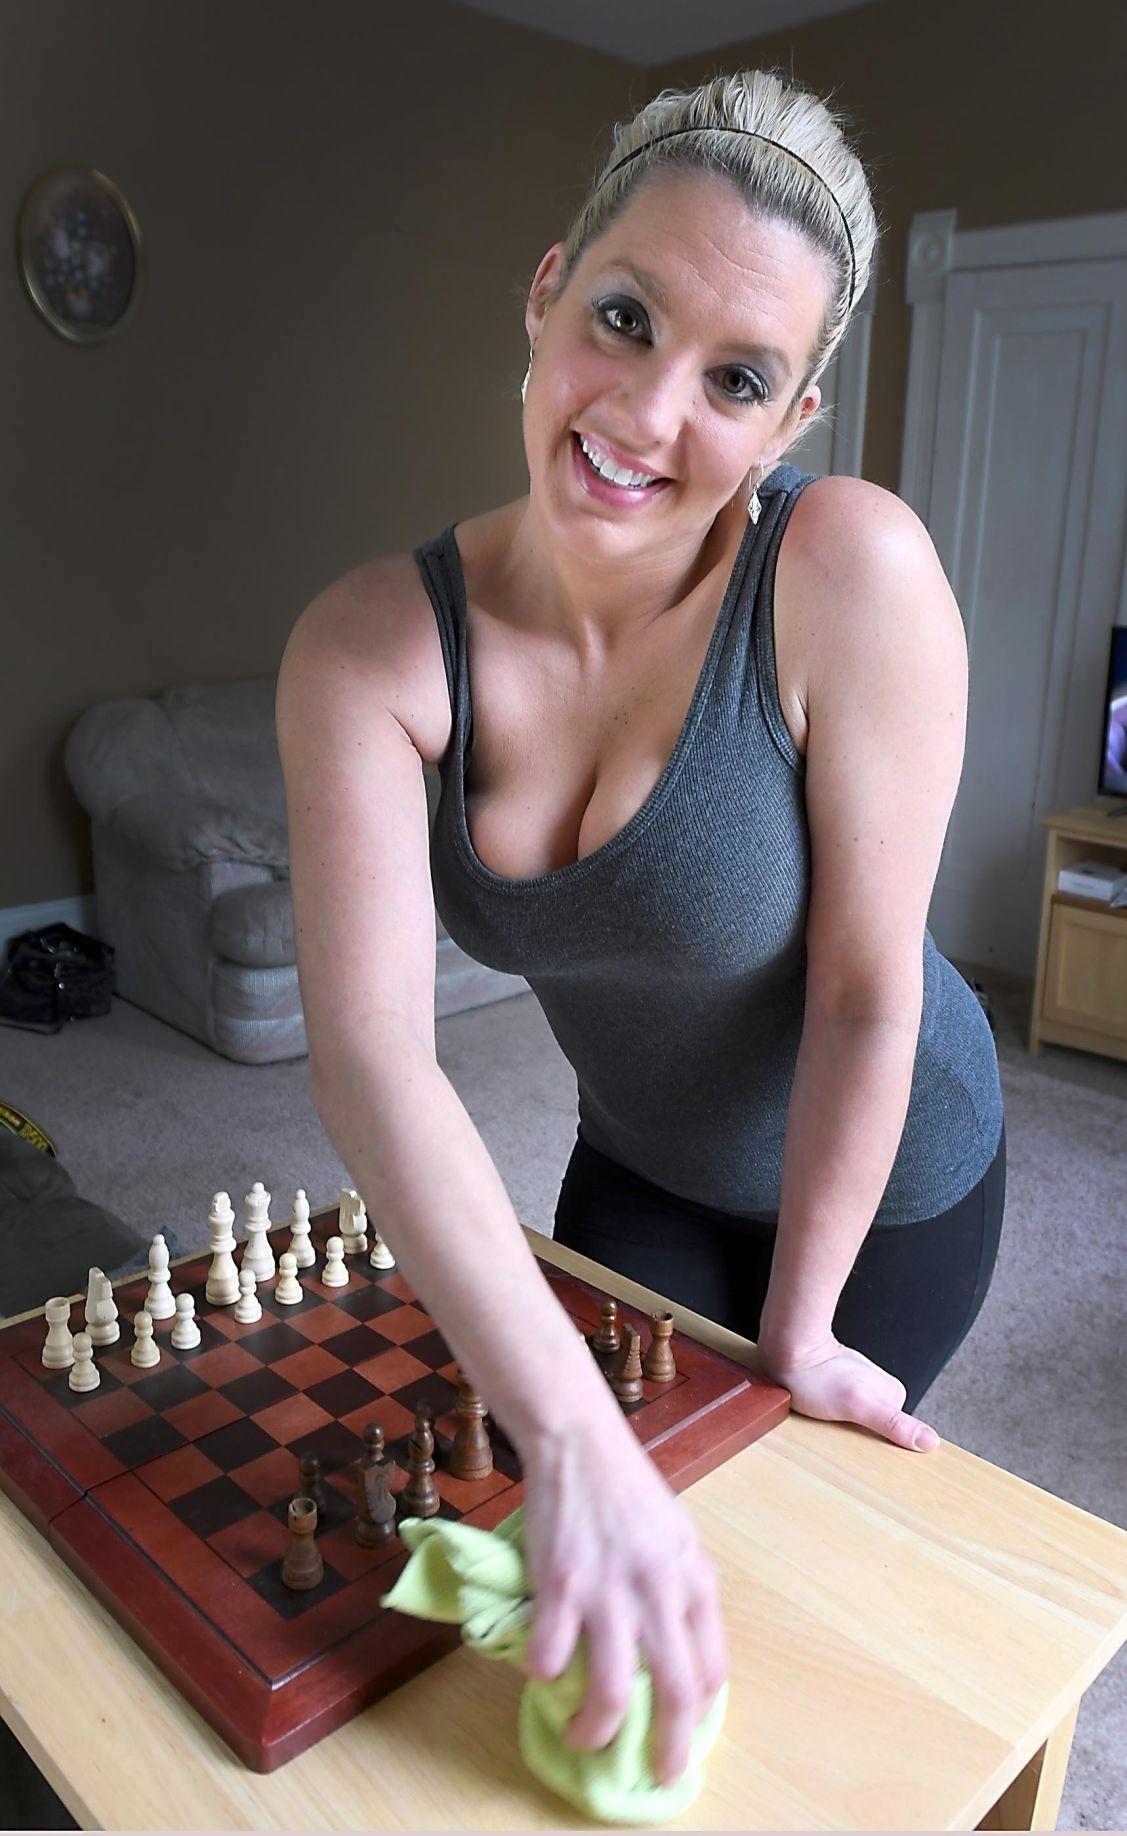 Tan girl naked exposing pussy